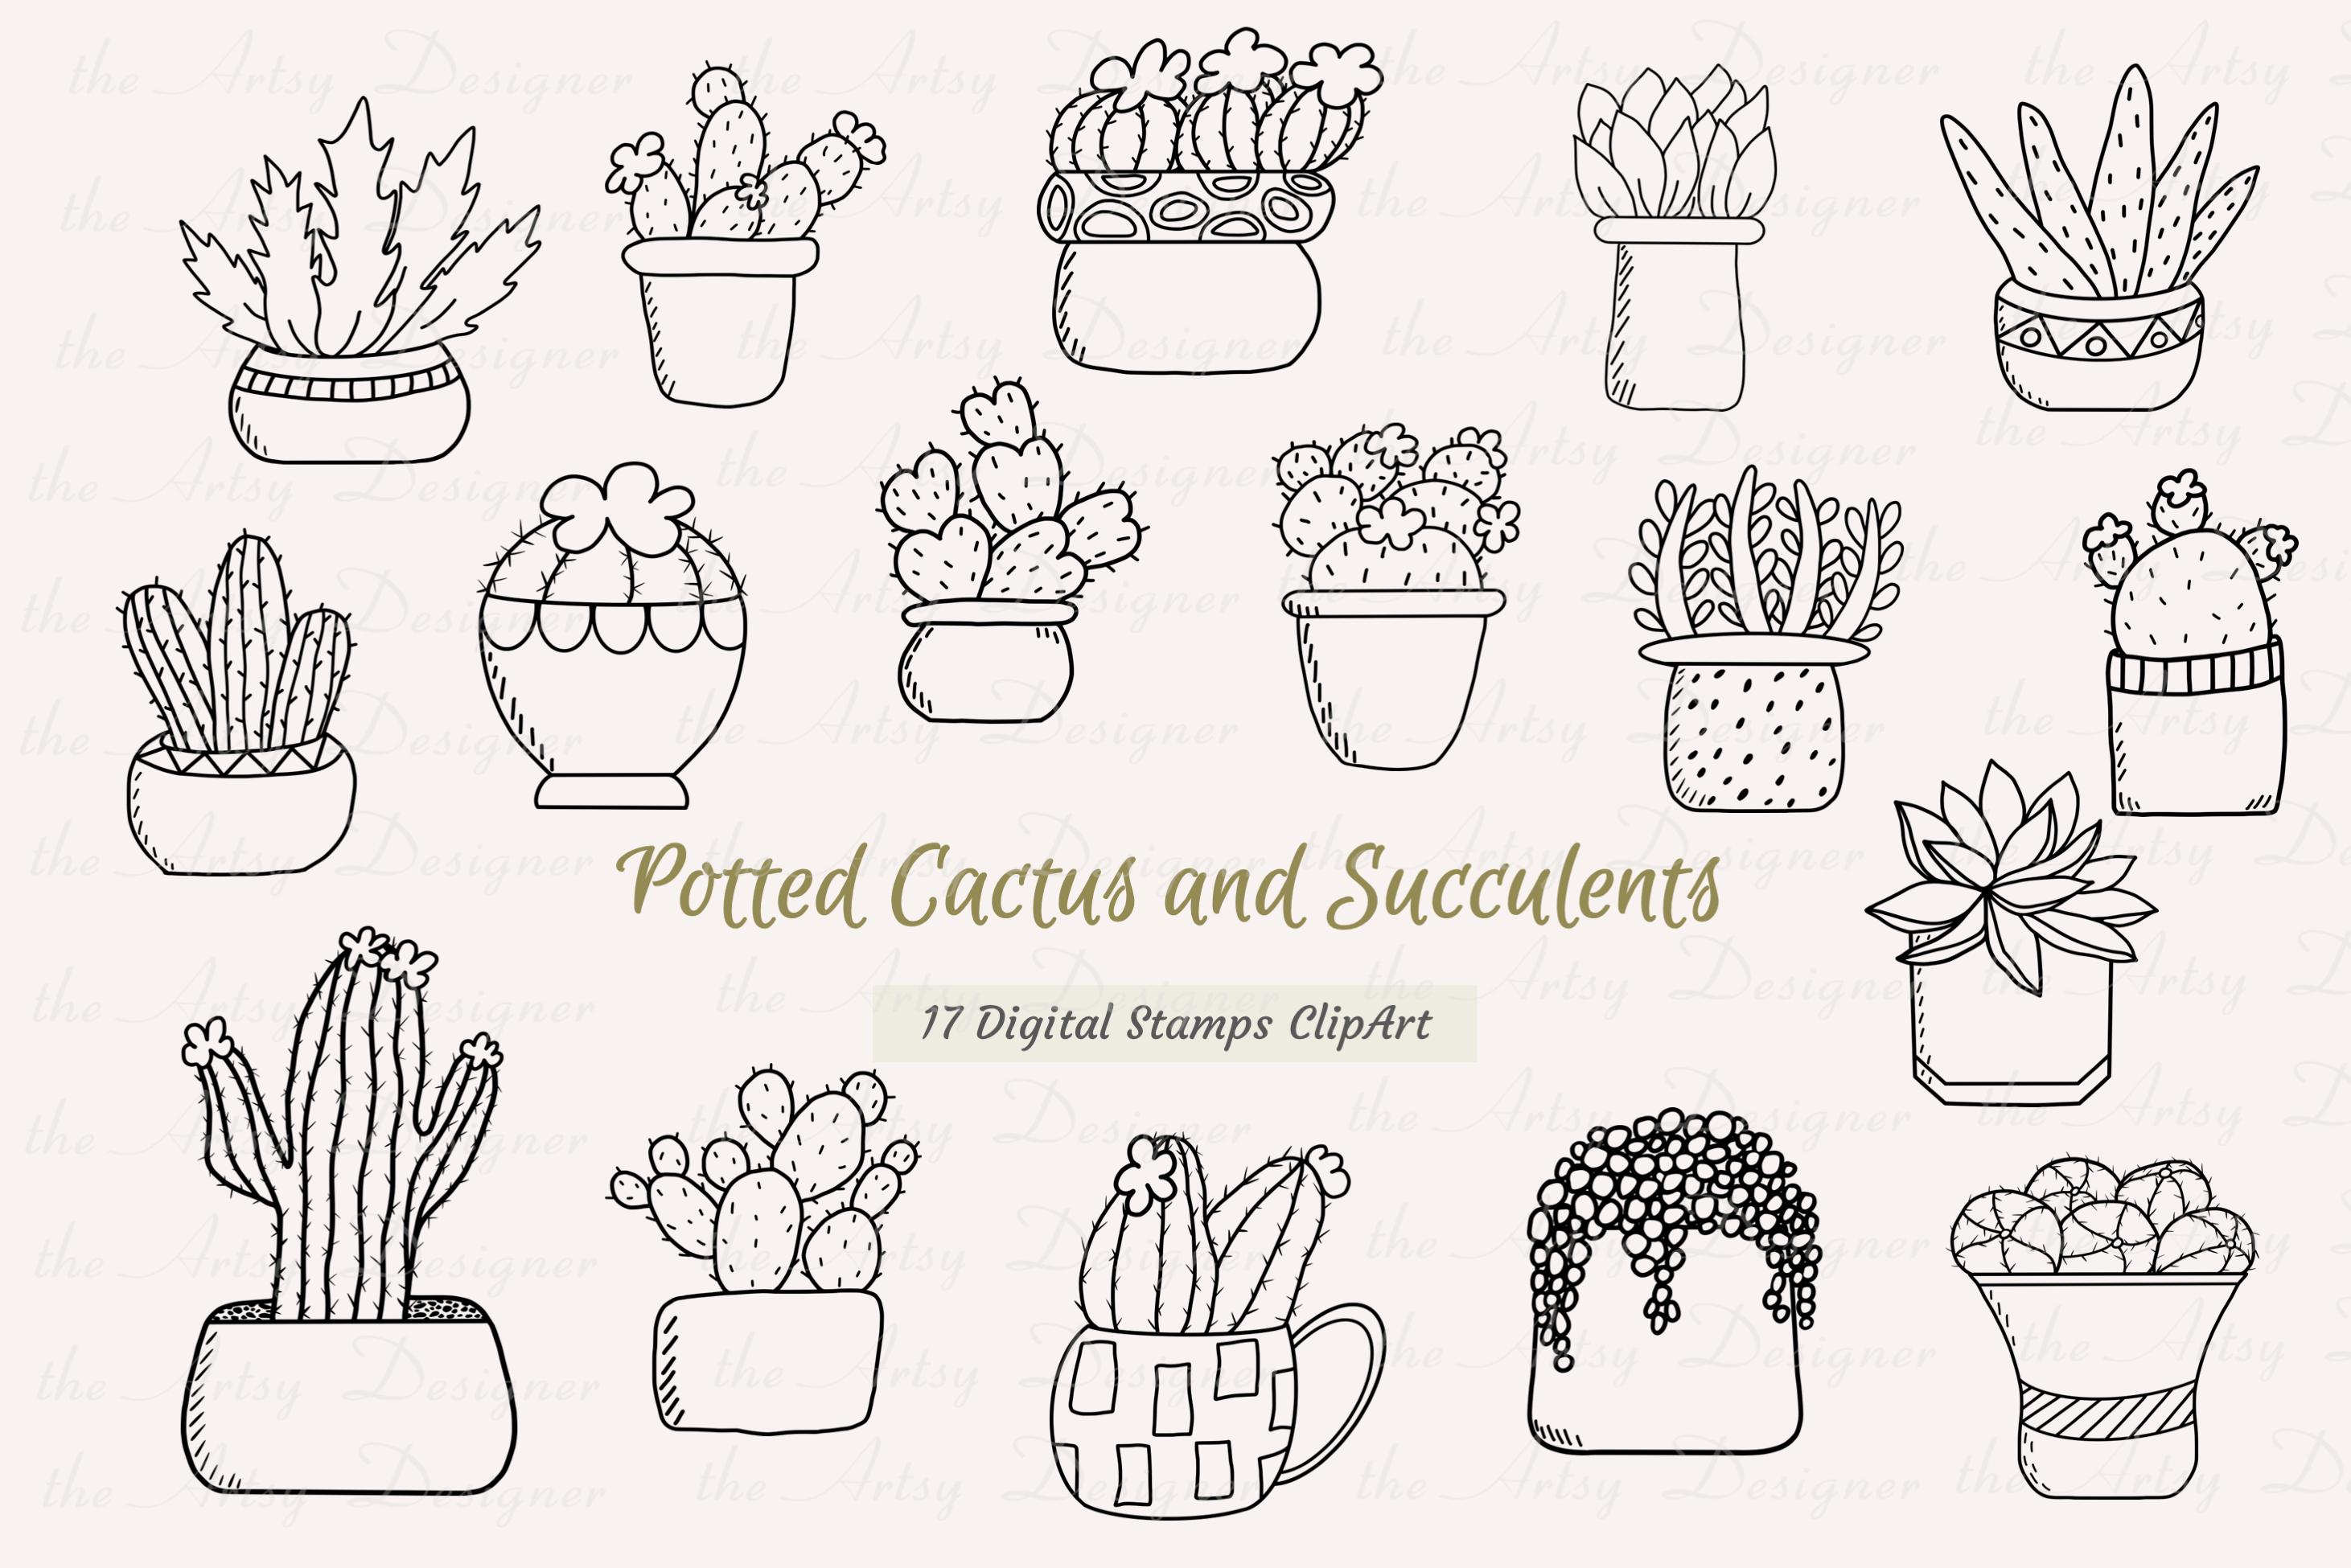 17 Digital Stamps Potted Cactus Succulents Clipart Bundle example image 1